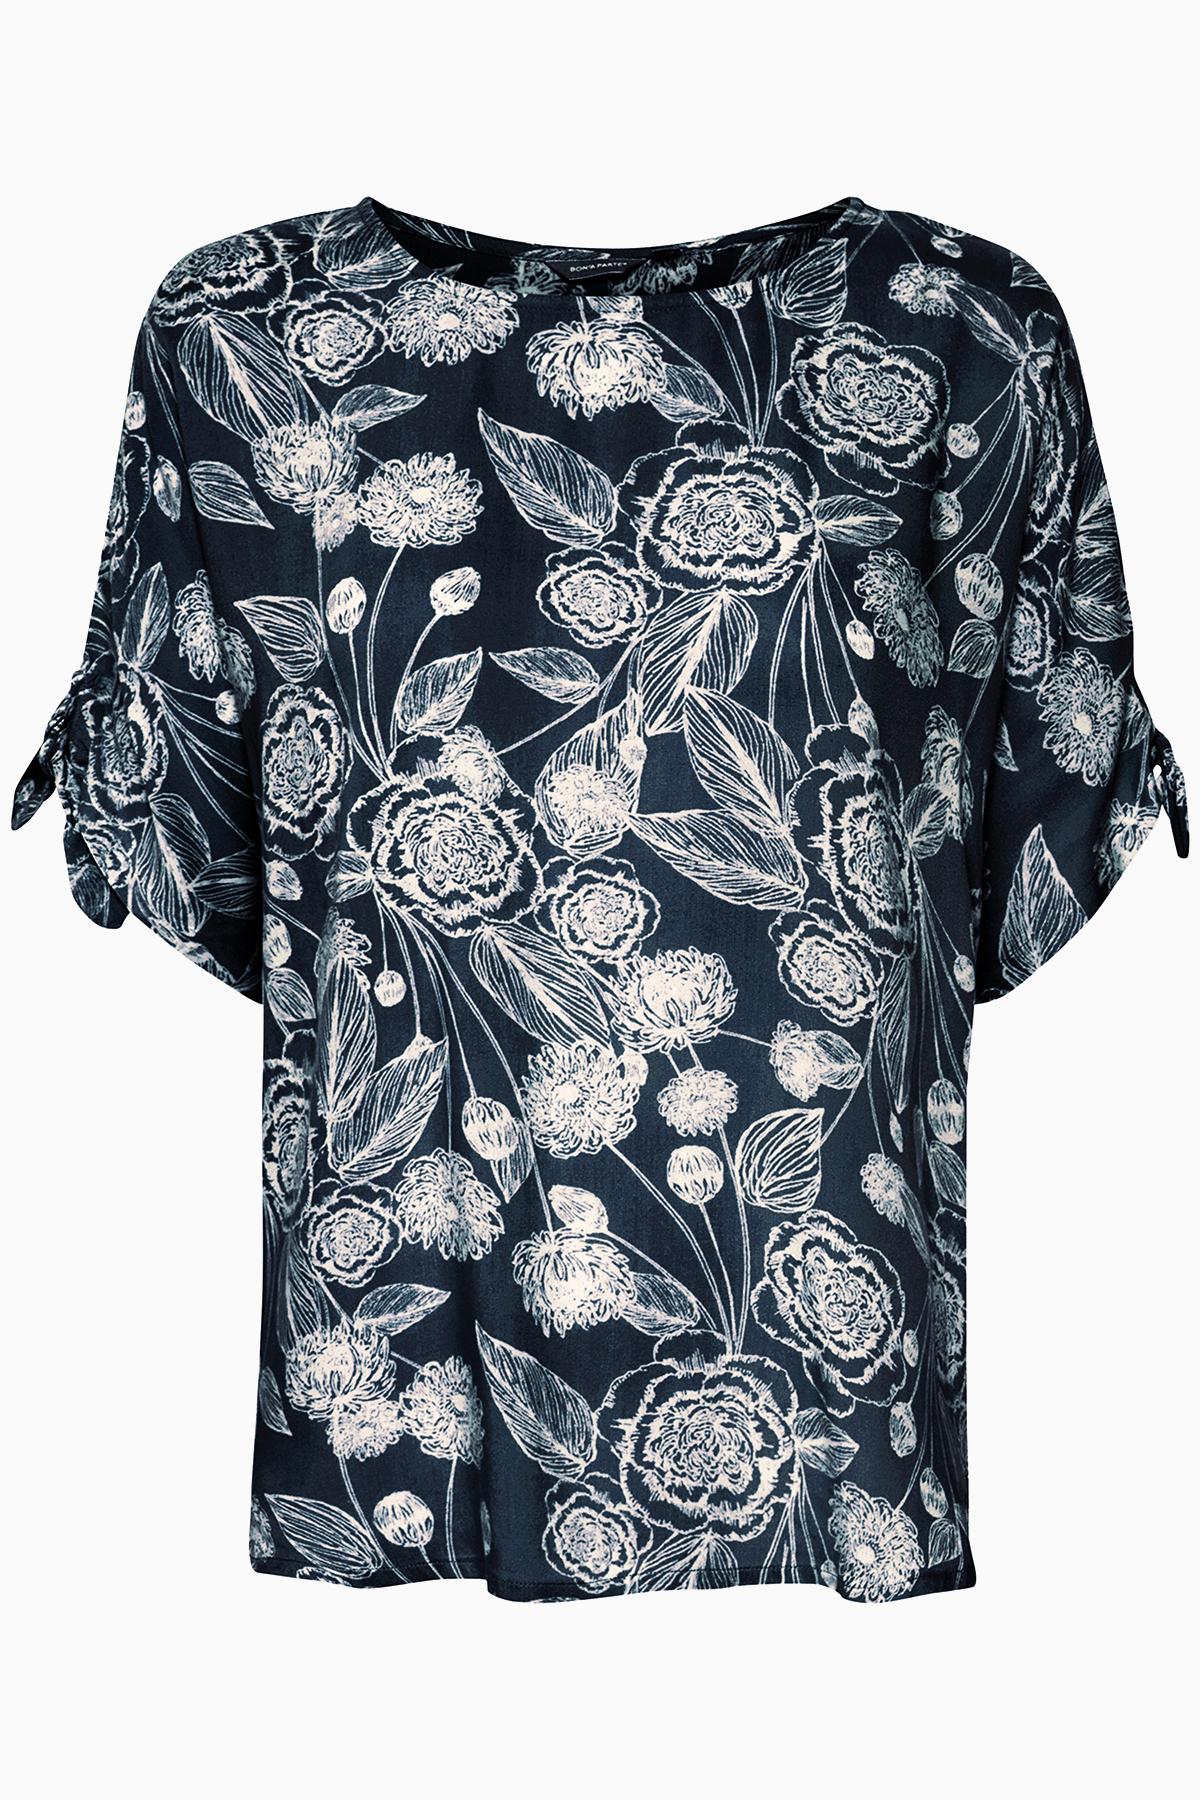 Marineblau/wollweiss Kurzarm-Bluse von Bon'A Parte – Shoppen SieMarineblau/wollweiss Kurzarm-Bluse ab Gr. S-2XL hier